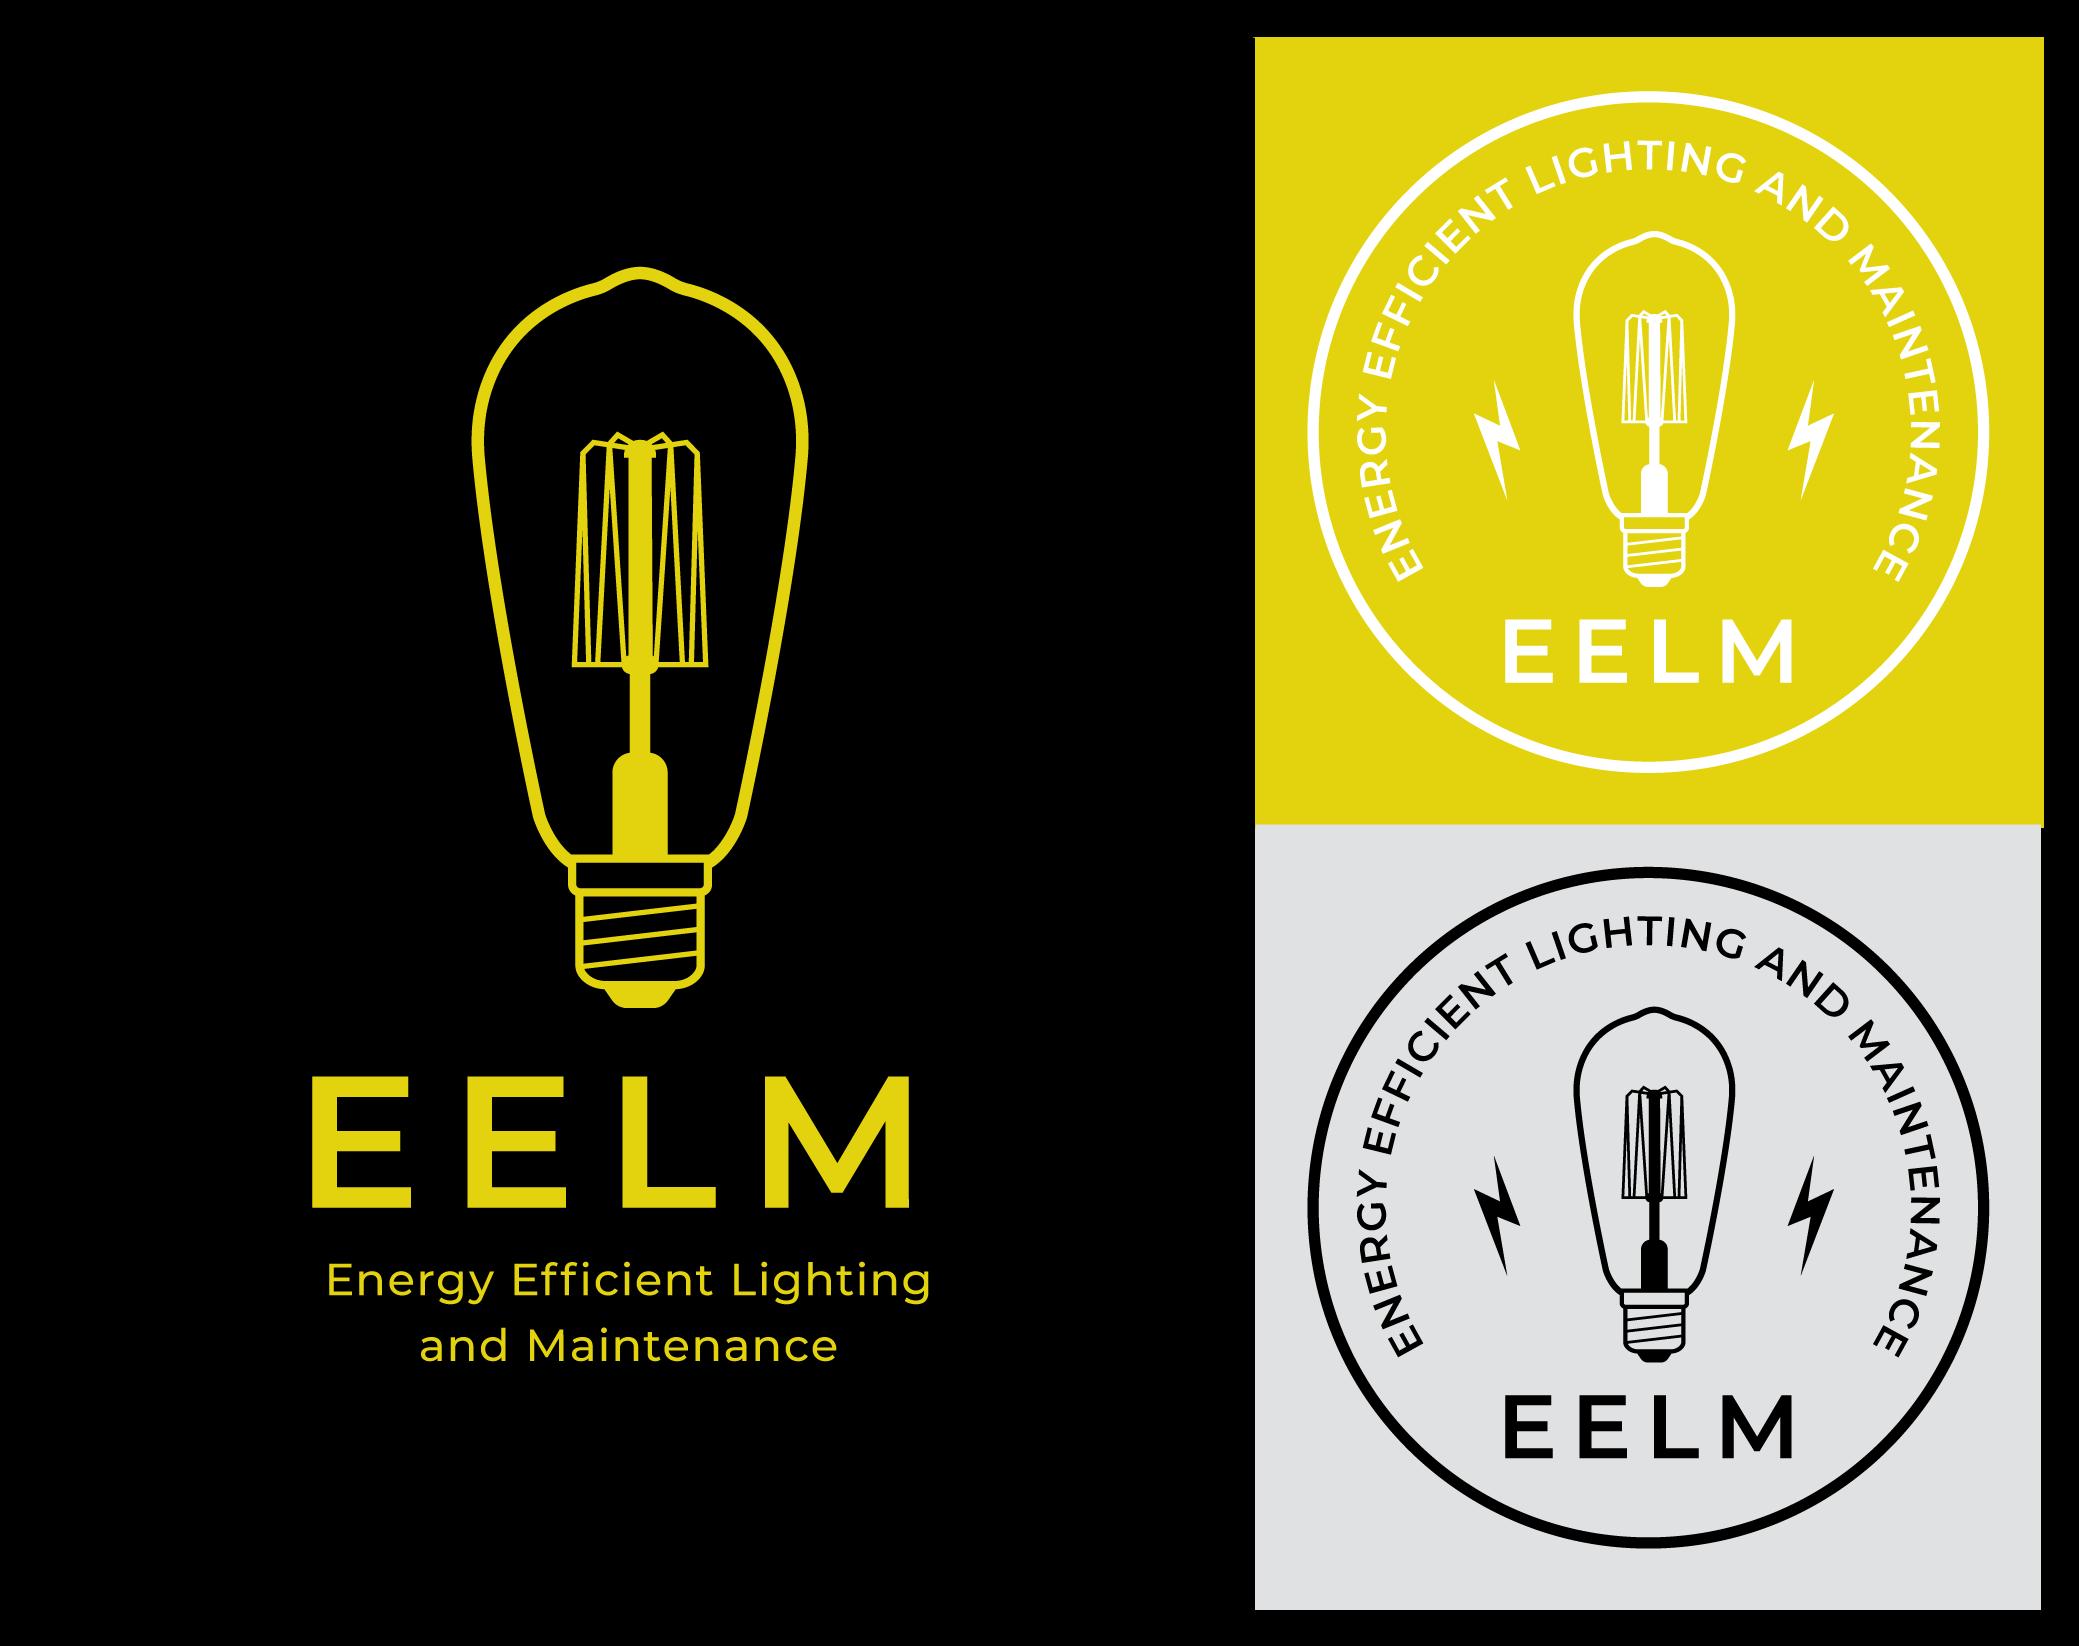 EELM Logo and Badge